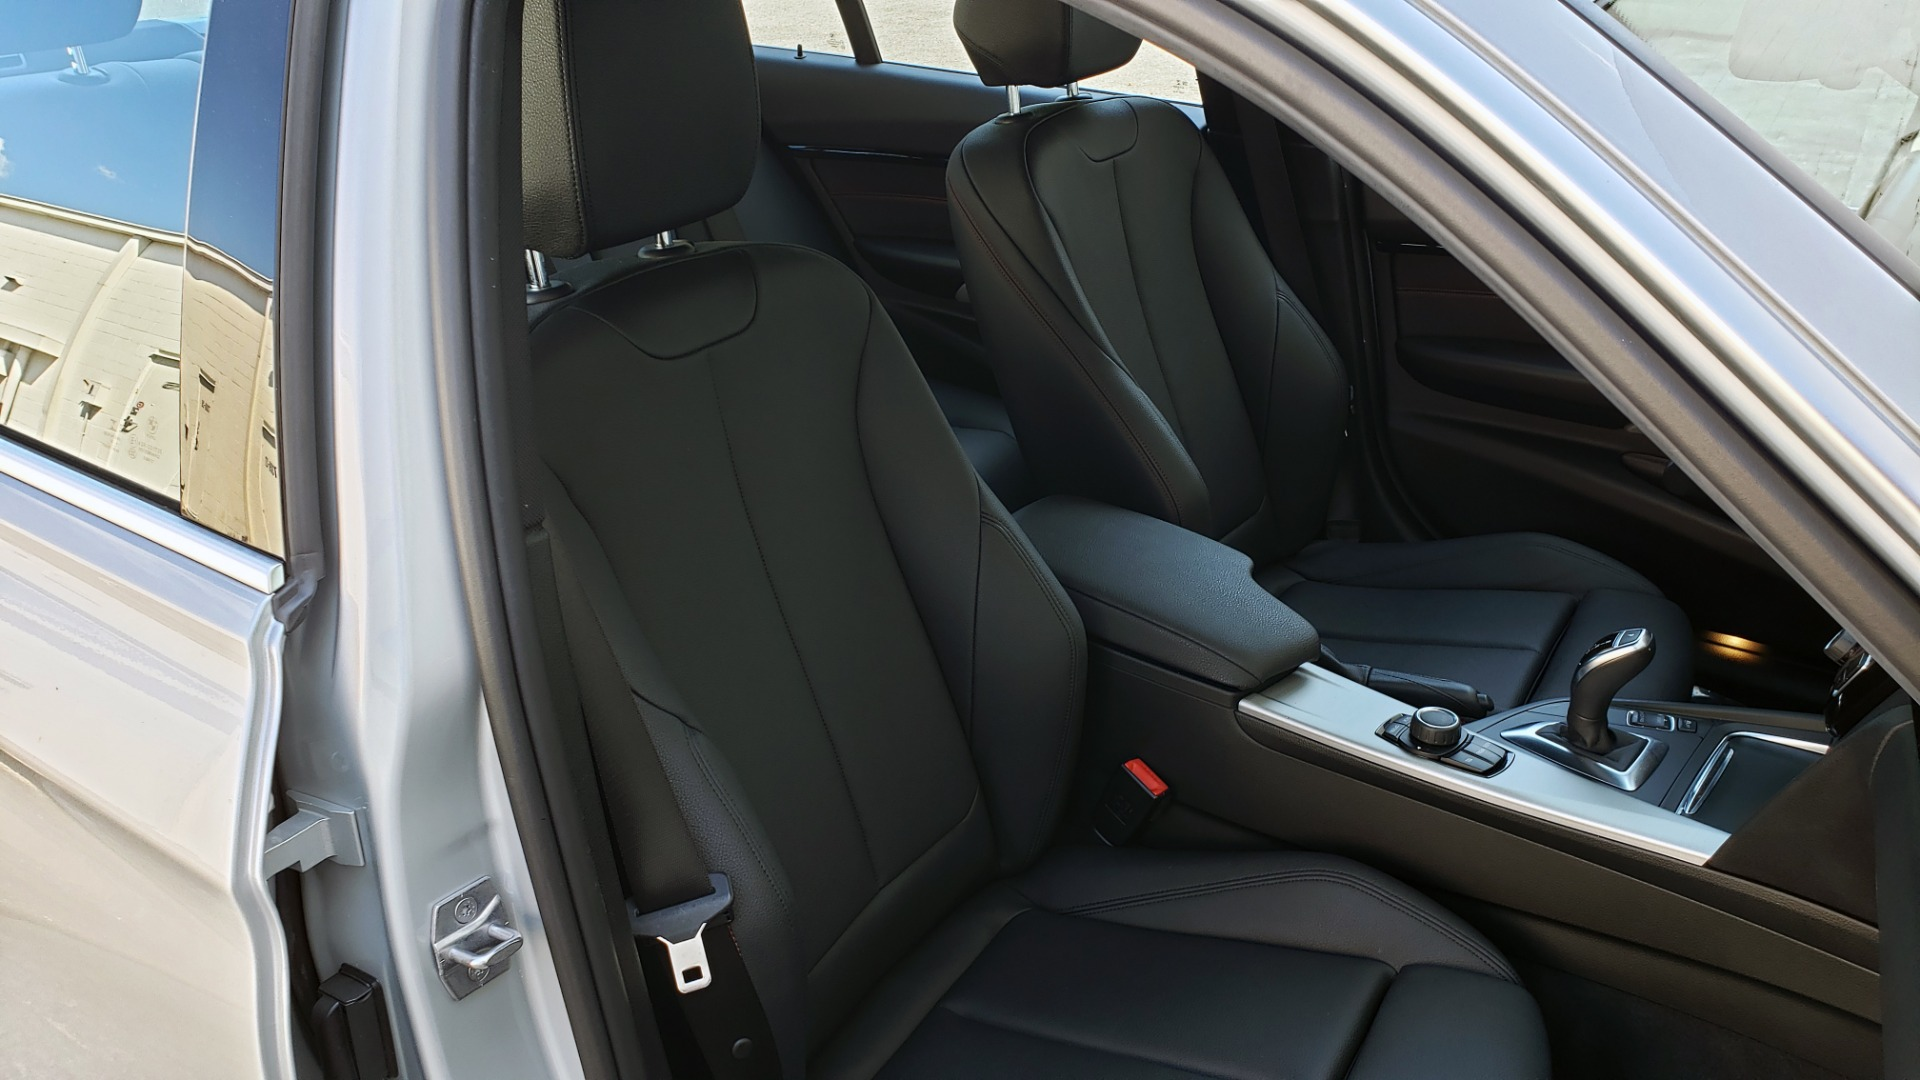 Used 2017 BMW 3 SERIES 330I SPORT SEDAN / DRVR ASST PKG / SUNROOF / REARVIEW for sale Sold at Formula Imports in Charlotte NC 28227 66